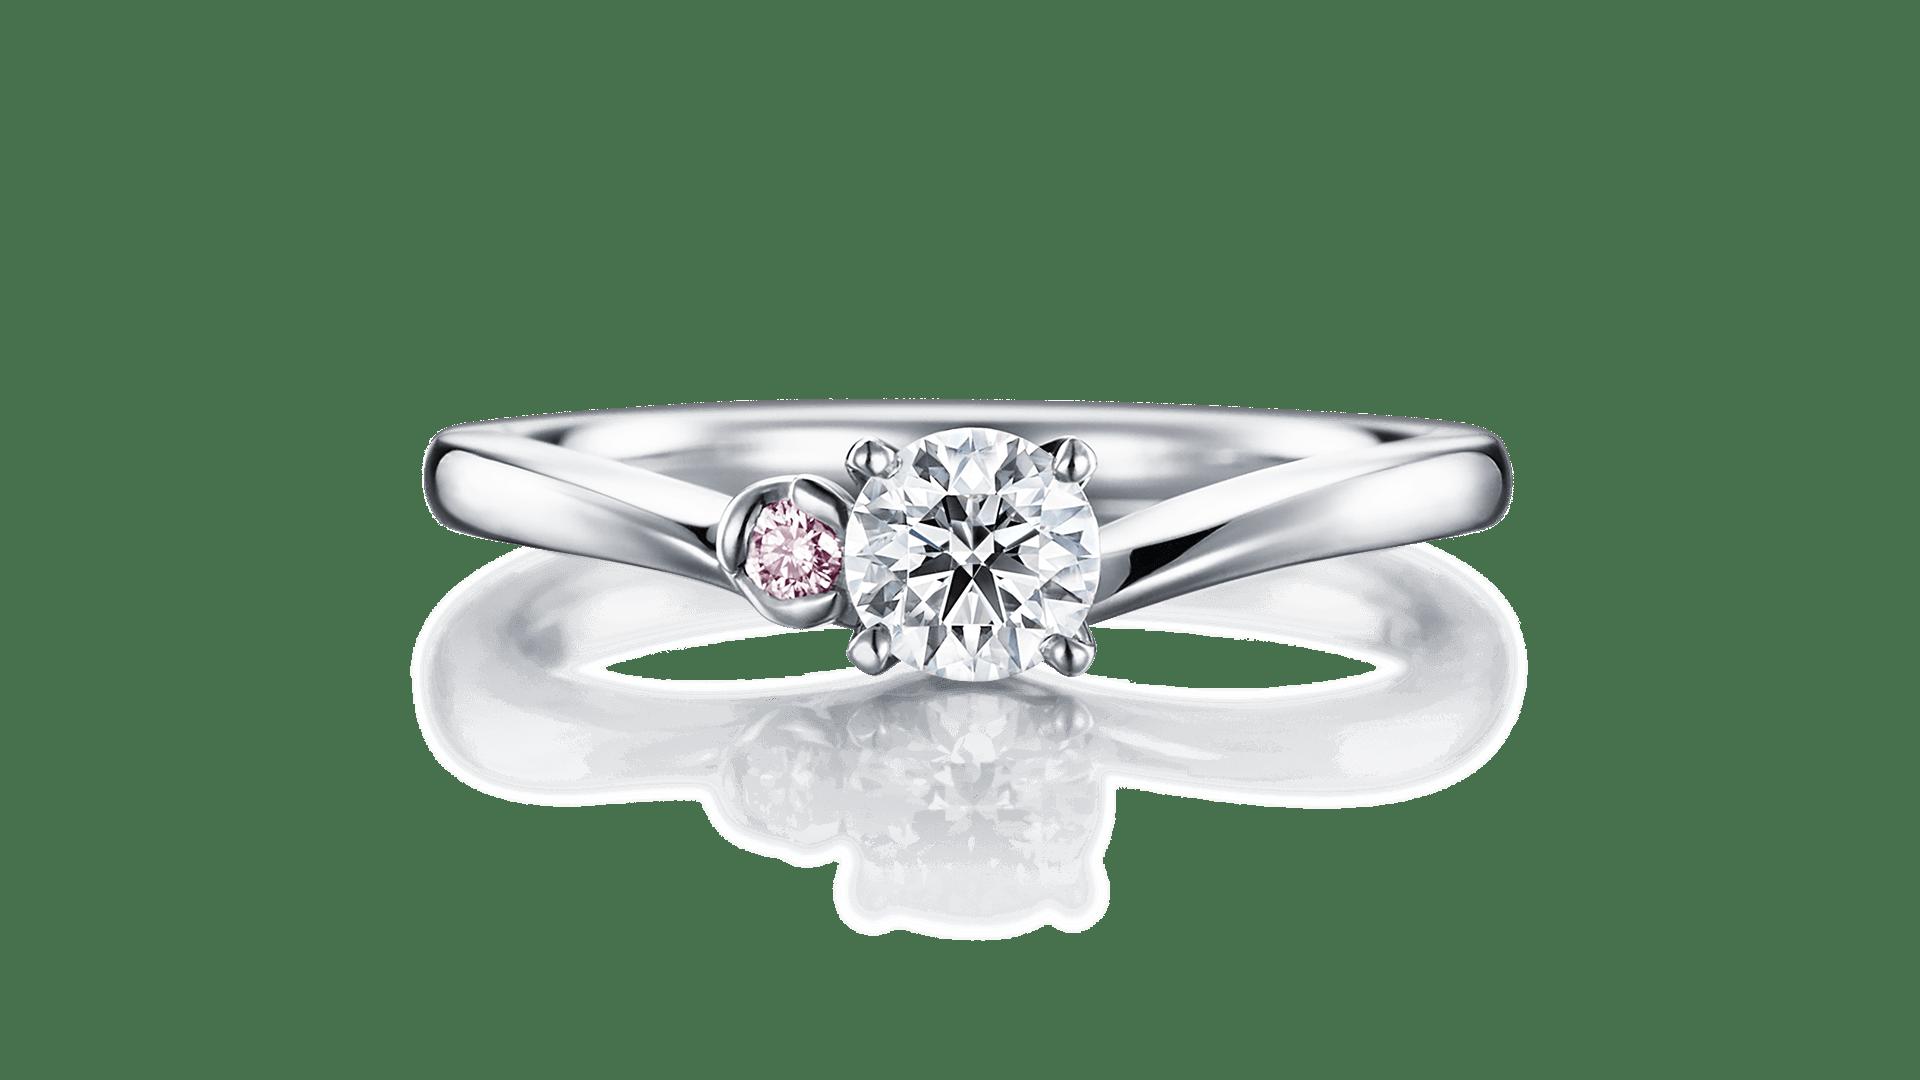 kiffa キファ | 婚約指輪サムネイル 1